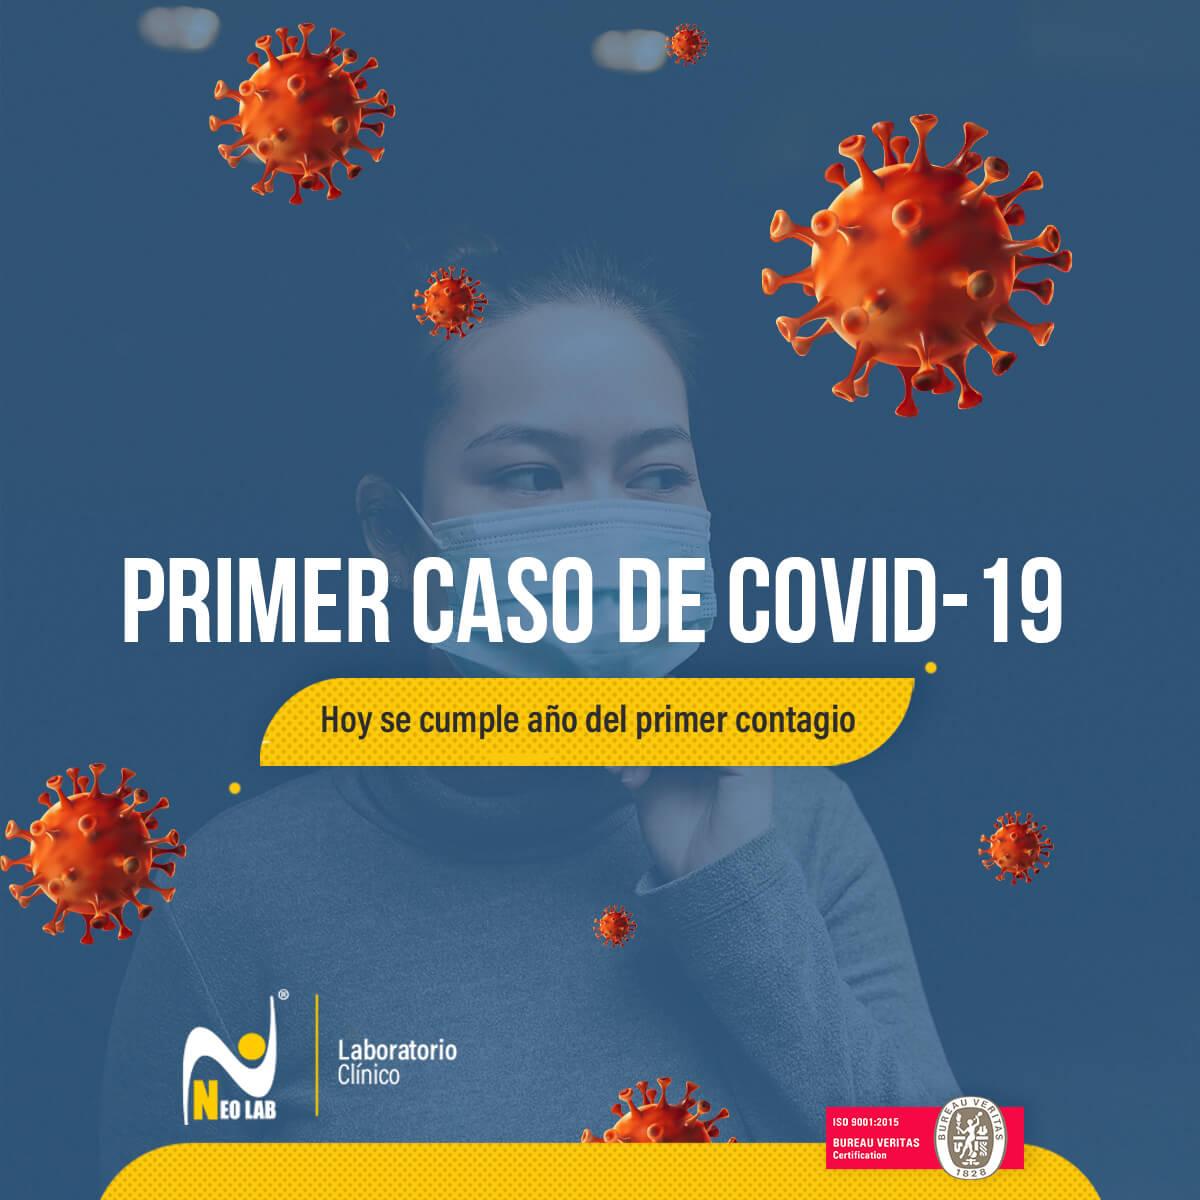 neolab_laboratorio_clinico_covid_aniversario_coronavirus